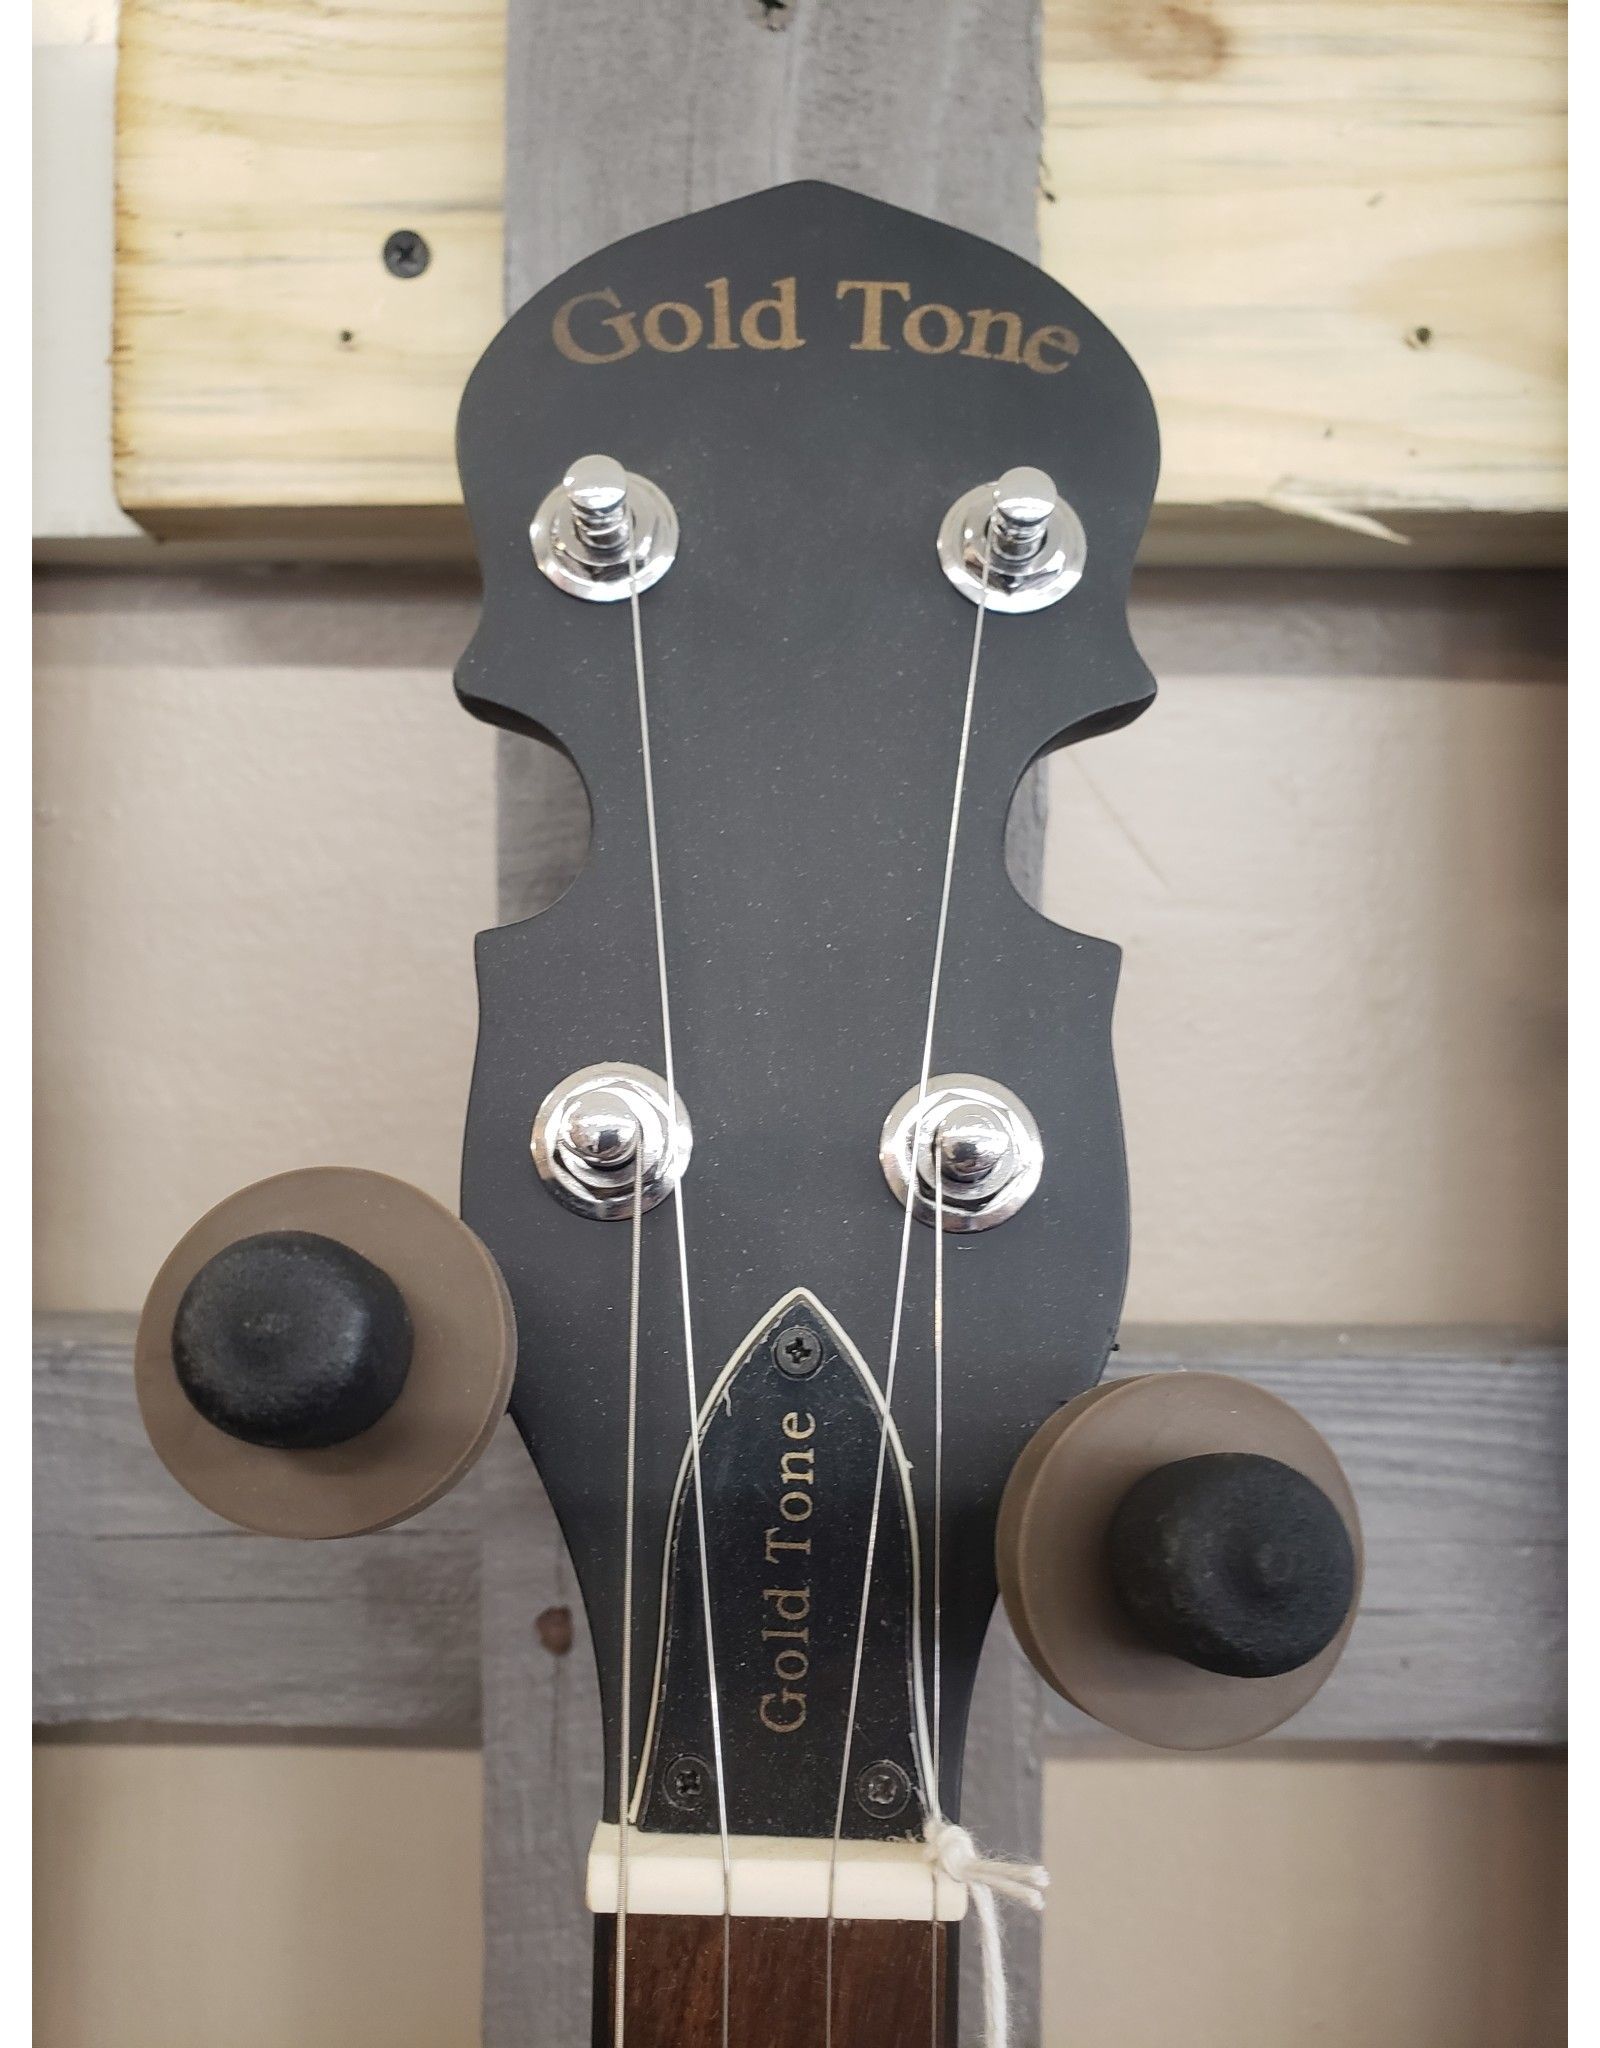 Gold Tone Gold Tone CC-50RP Cripple Creek Resonator Banjo w/Gig Bag